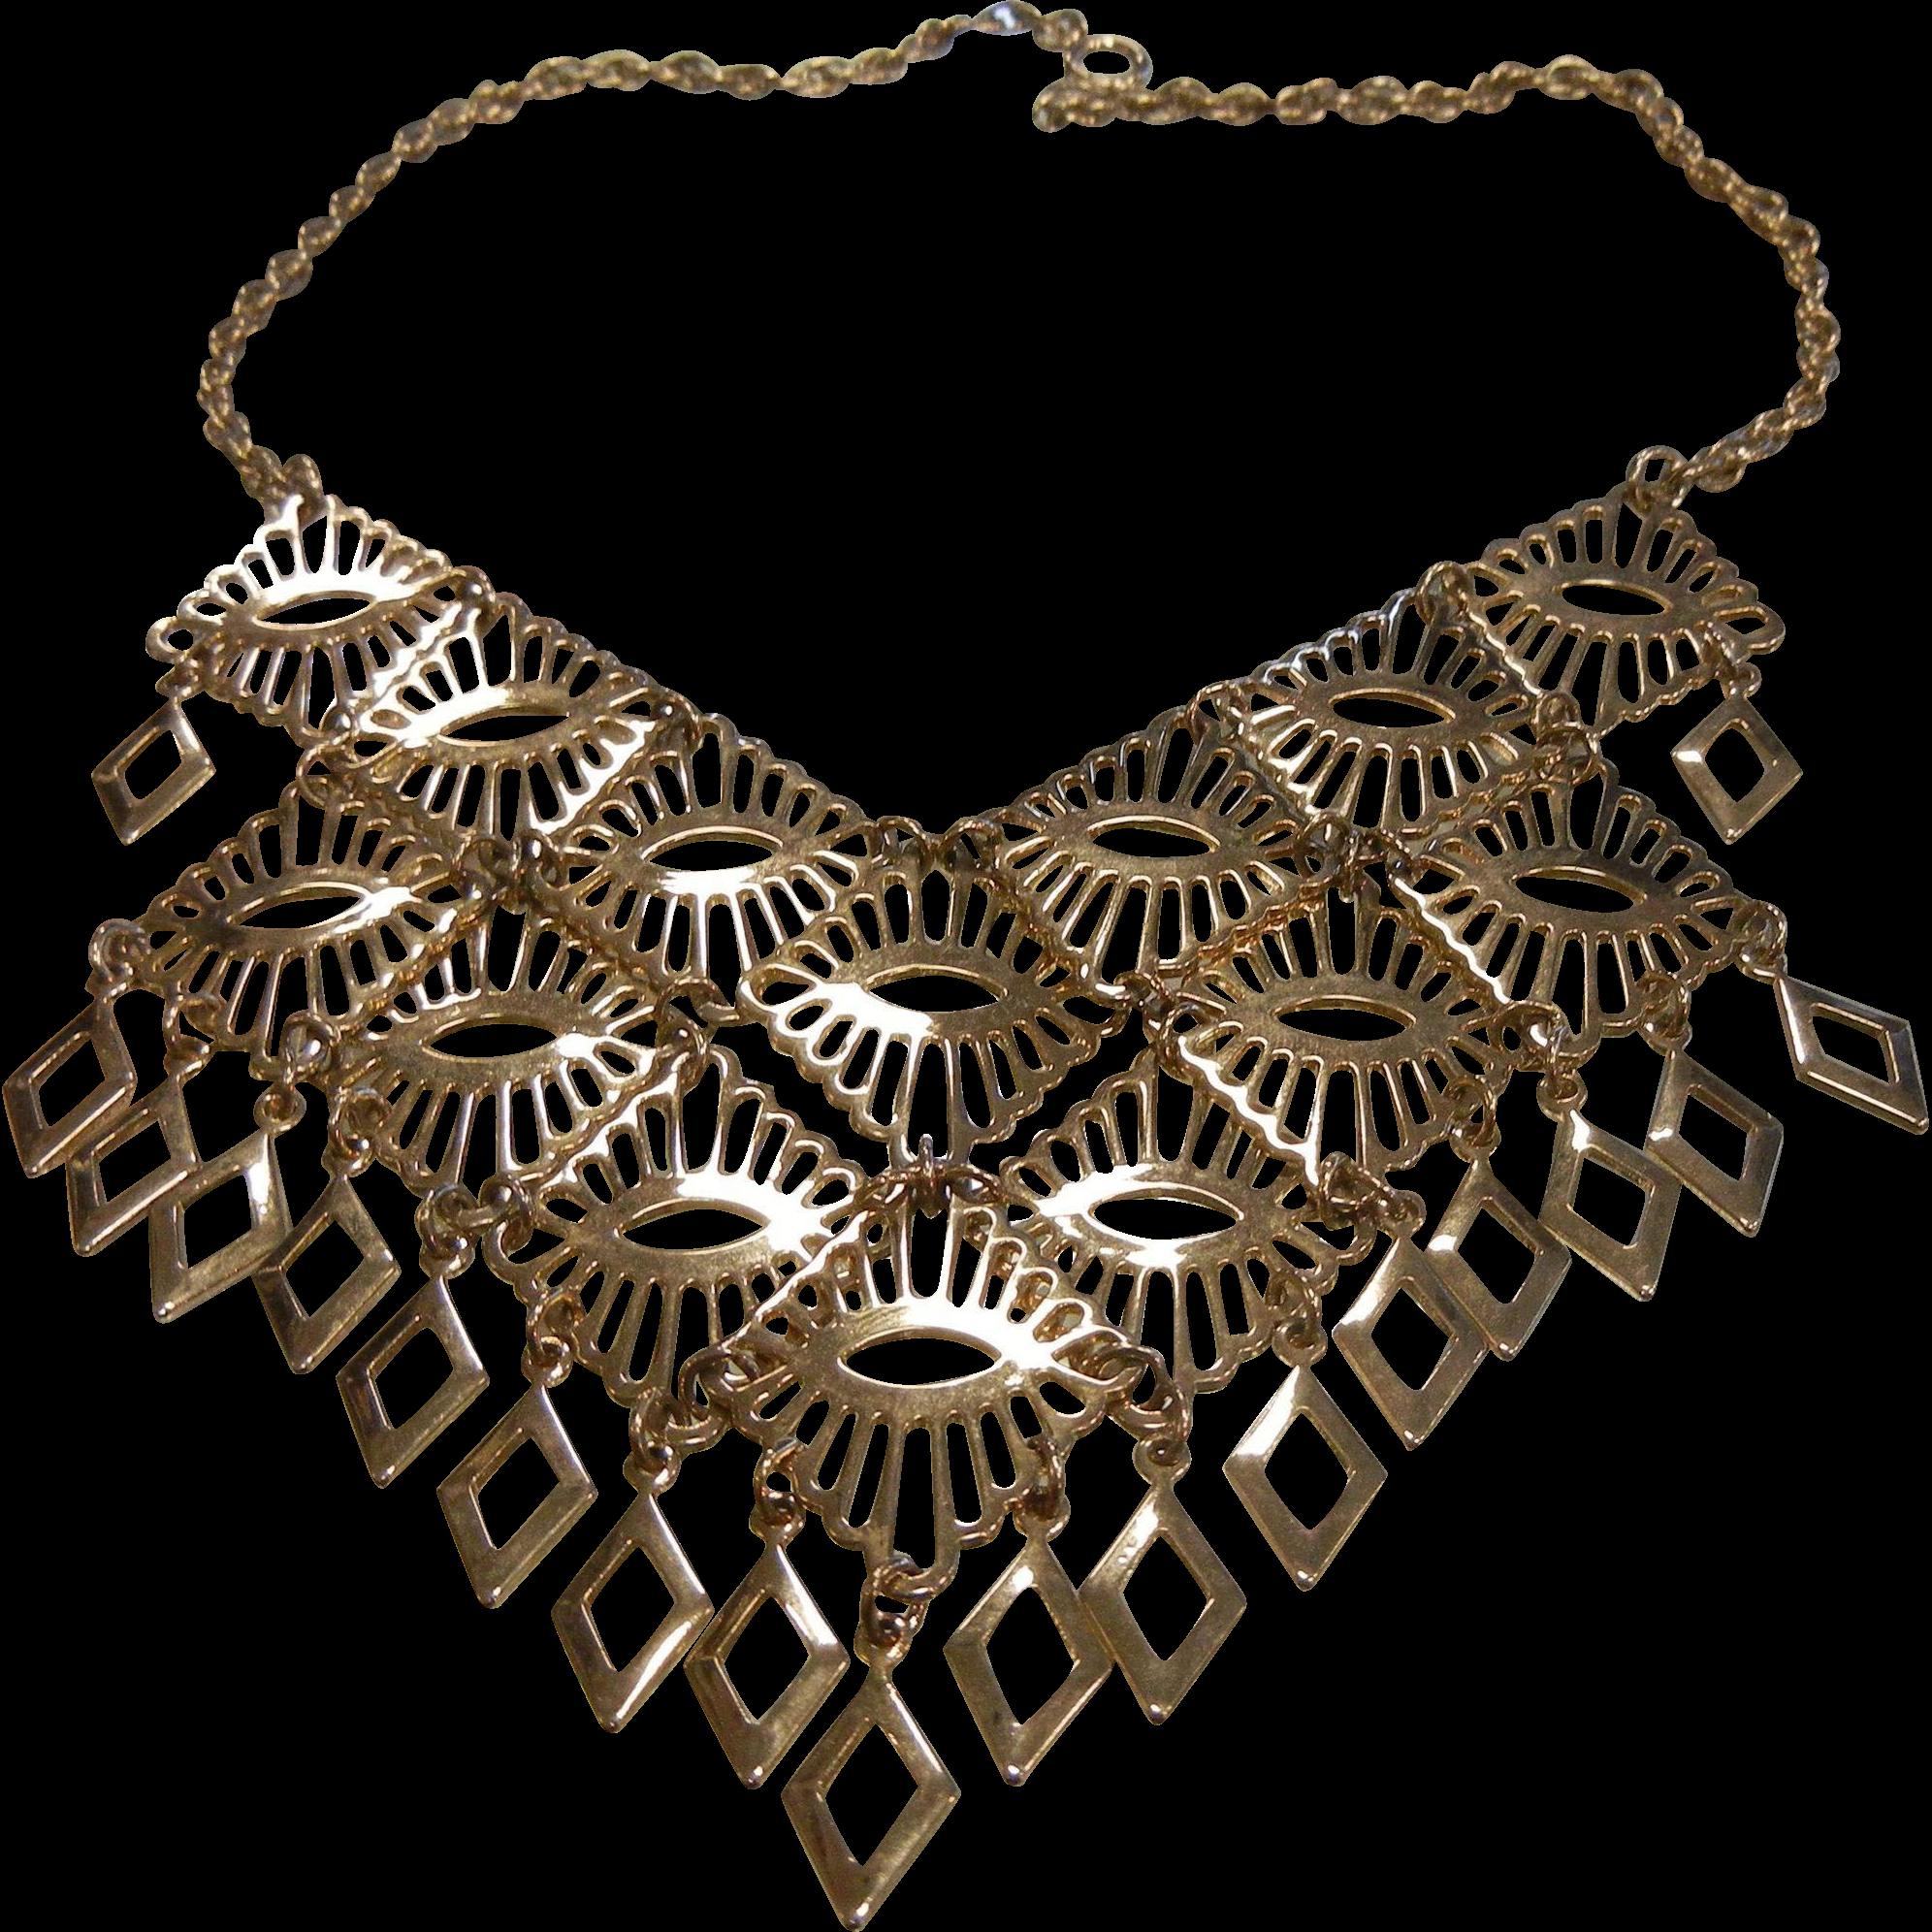 Vintage Mid Century Gold-Tone Bib Necklace